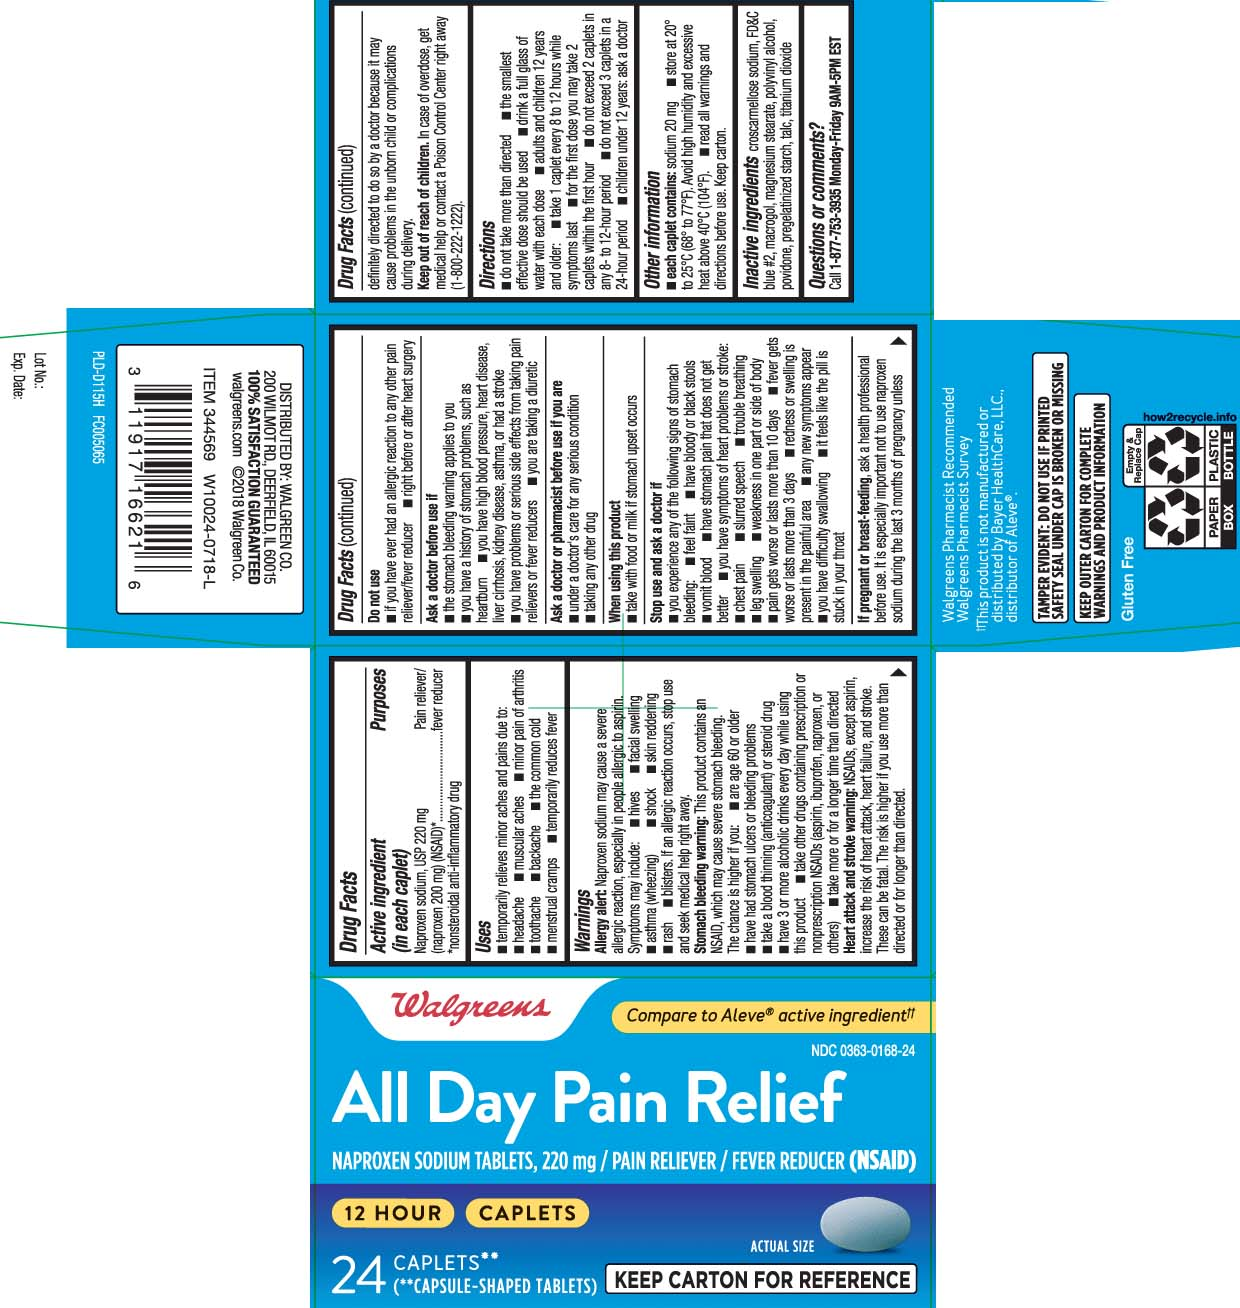 Naproxen sodium USP 220 mg (naproxen 200 mg) (NSAID)* *nonsteroidal anti-inflammatory drug